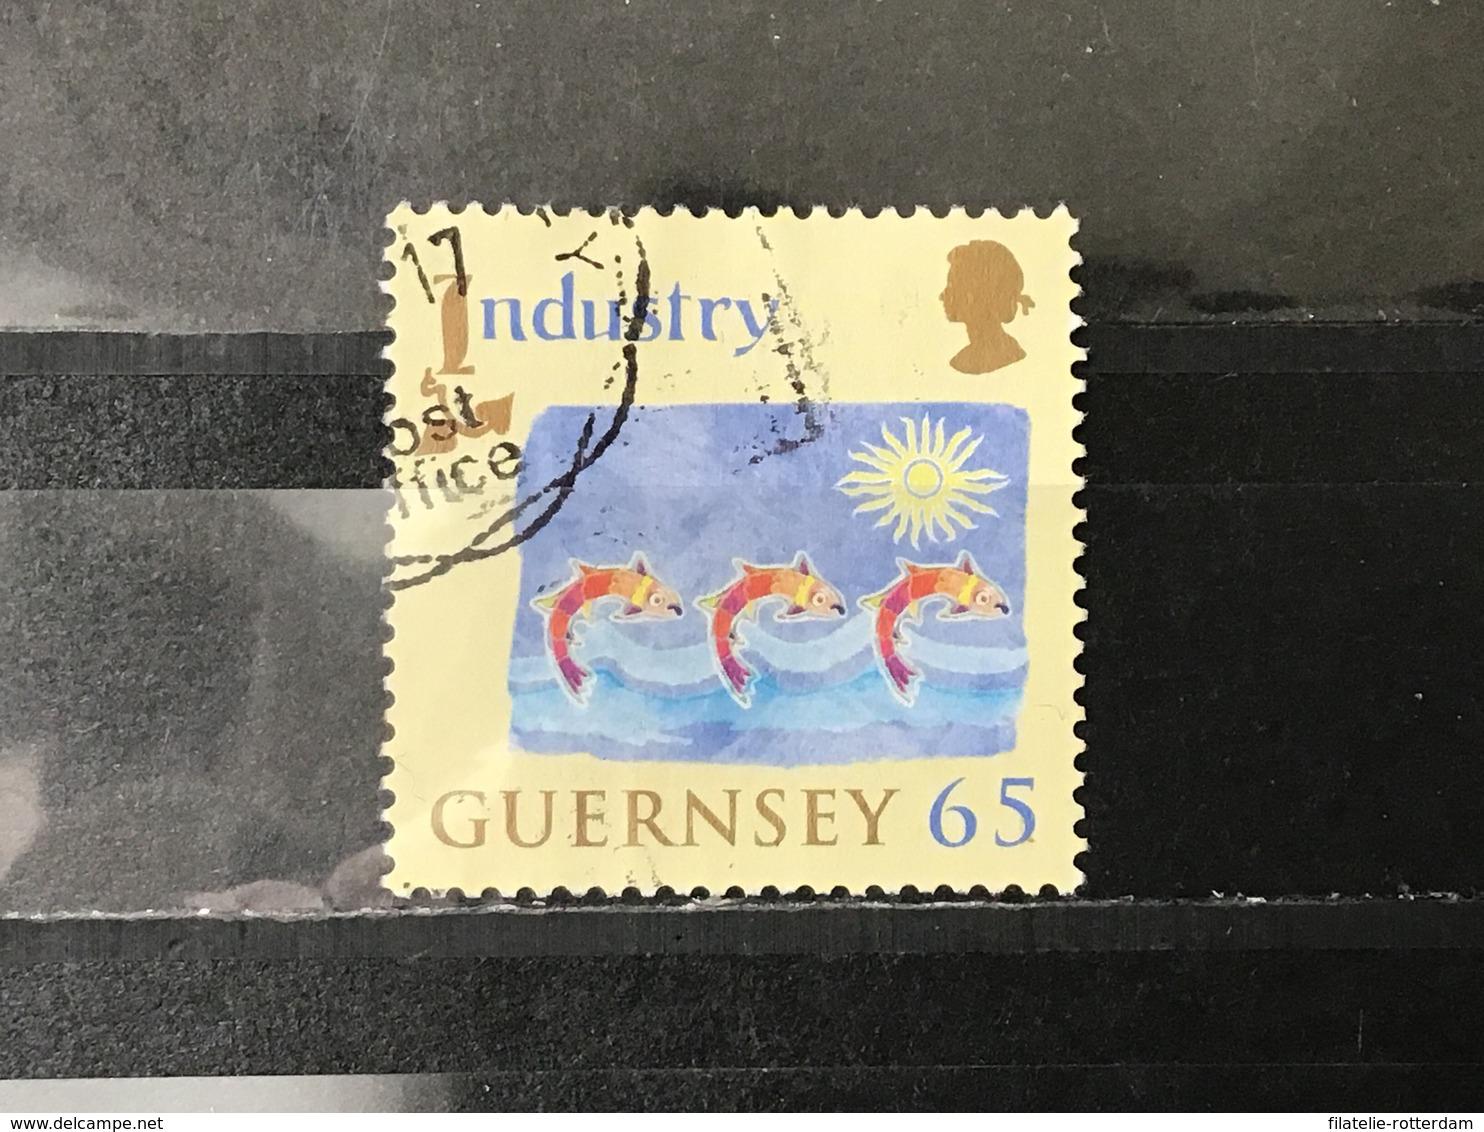 Guernsey - Betrekkingen Met Groot-Brittannië (65) 2004 - Guernsey